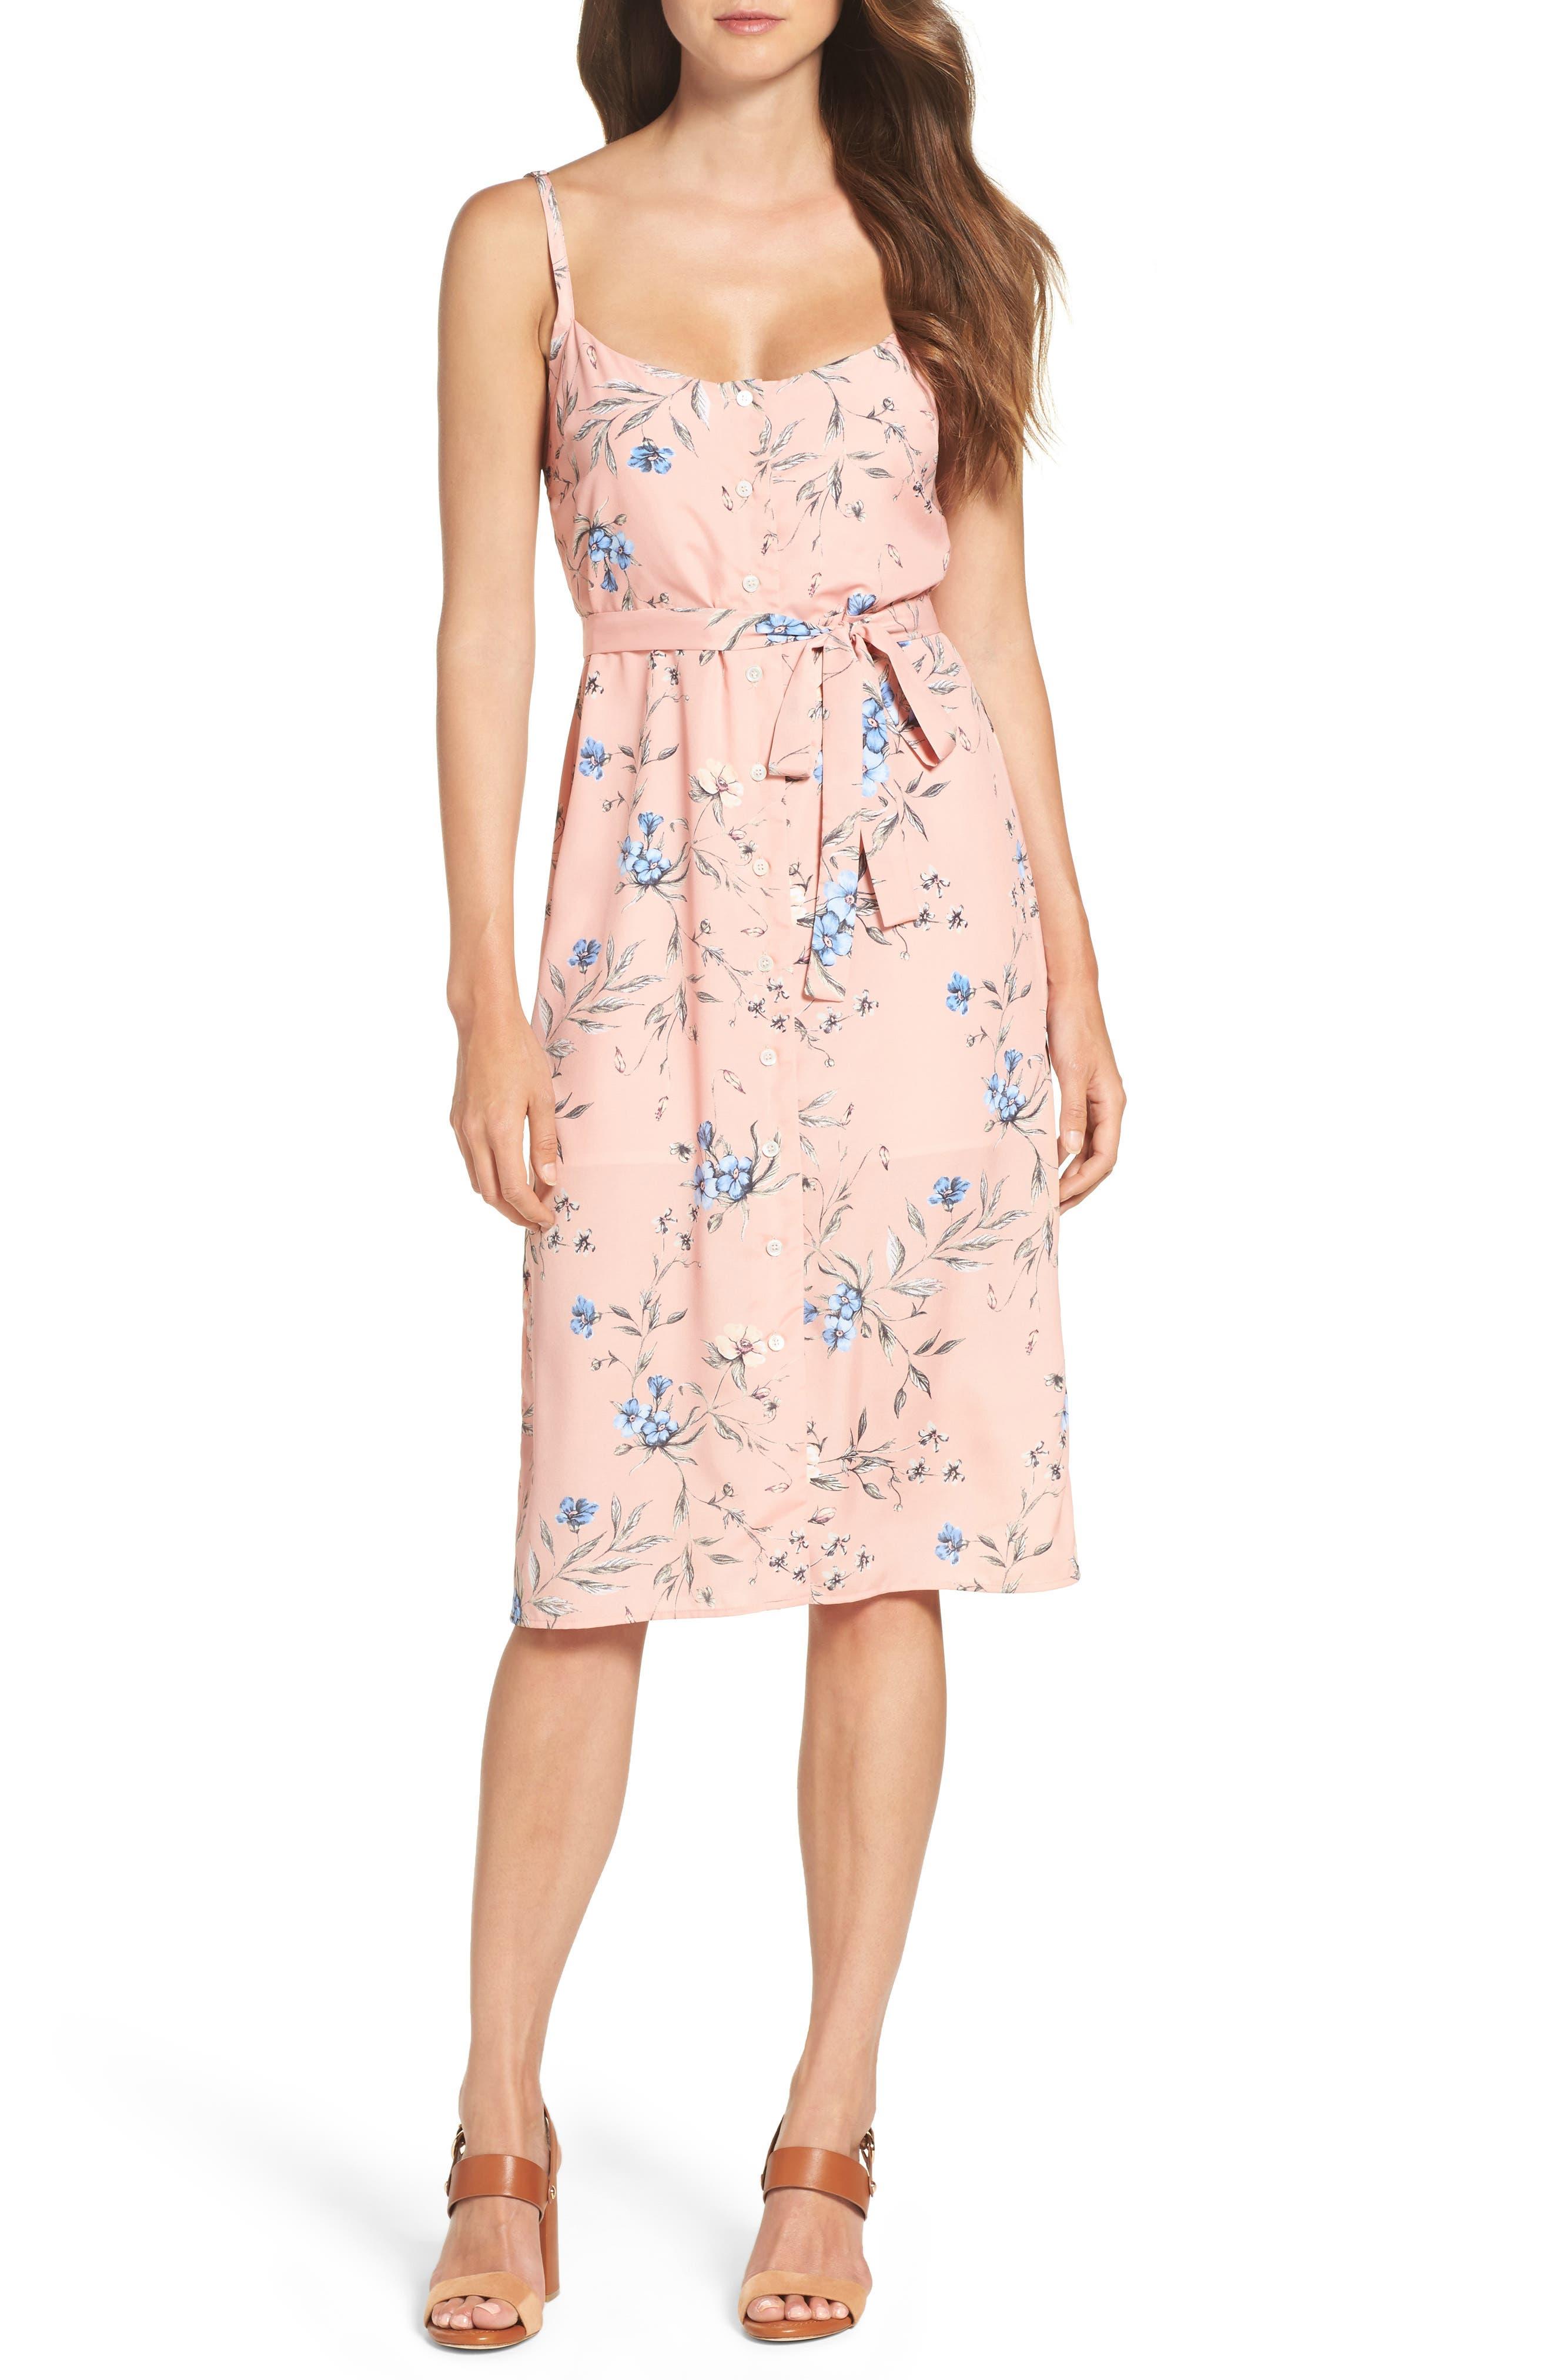 Main Image - Ali & Jay Flower Frolicking Midi Dress